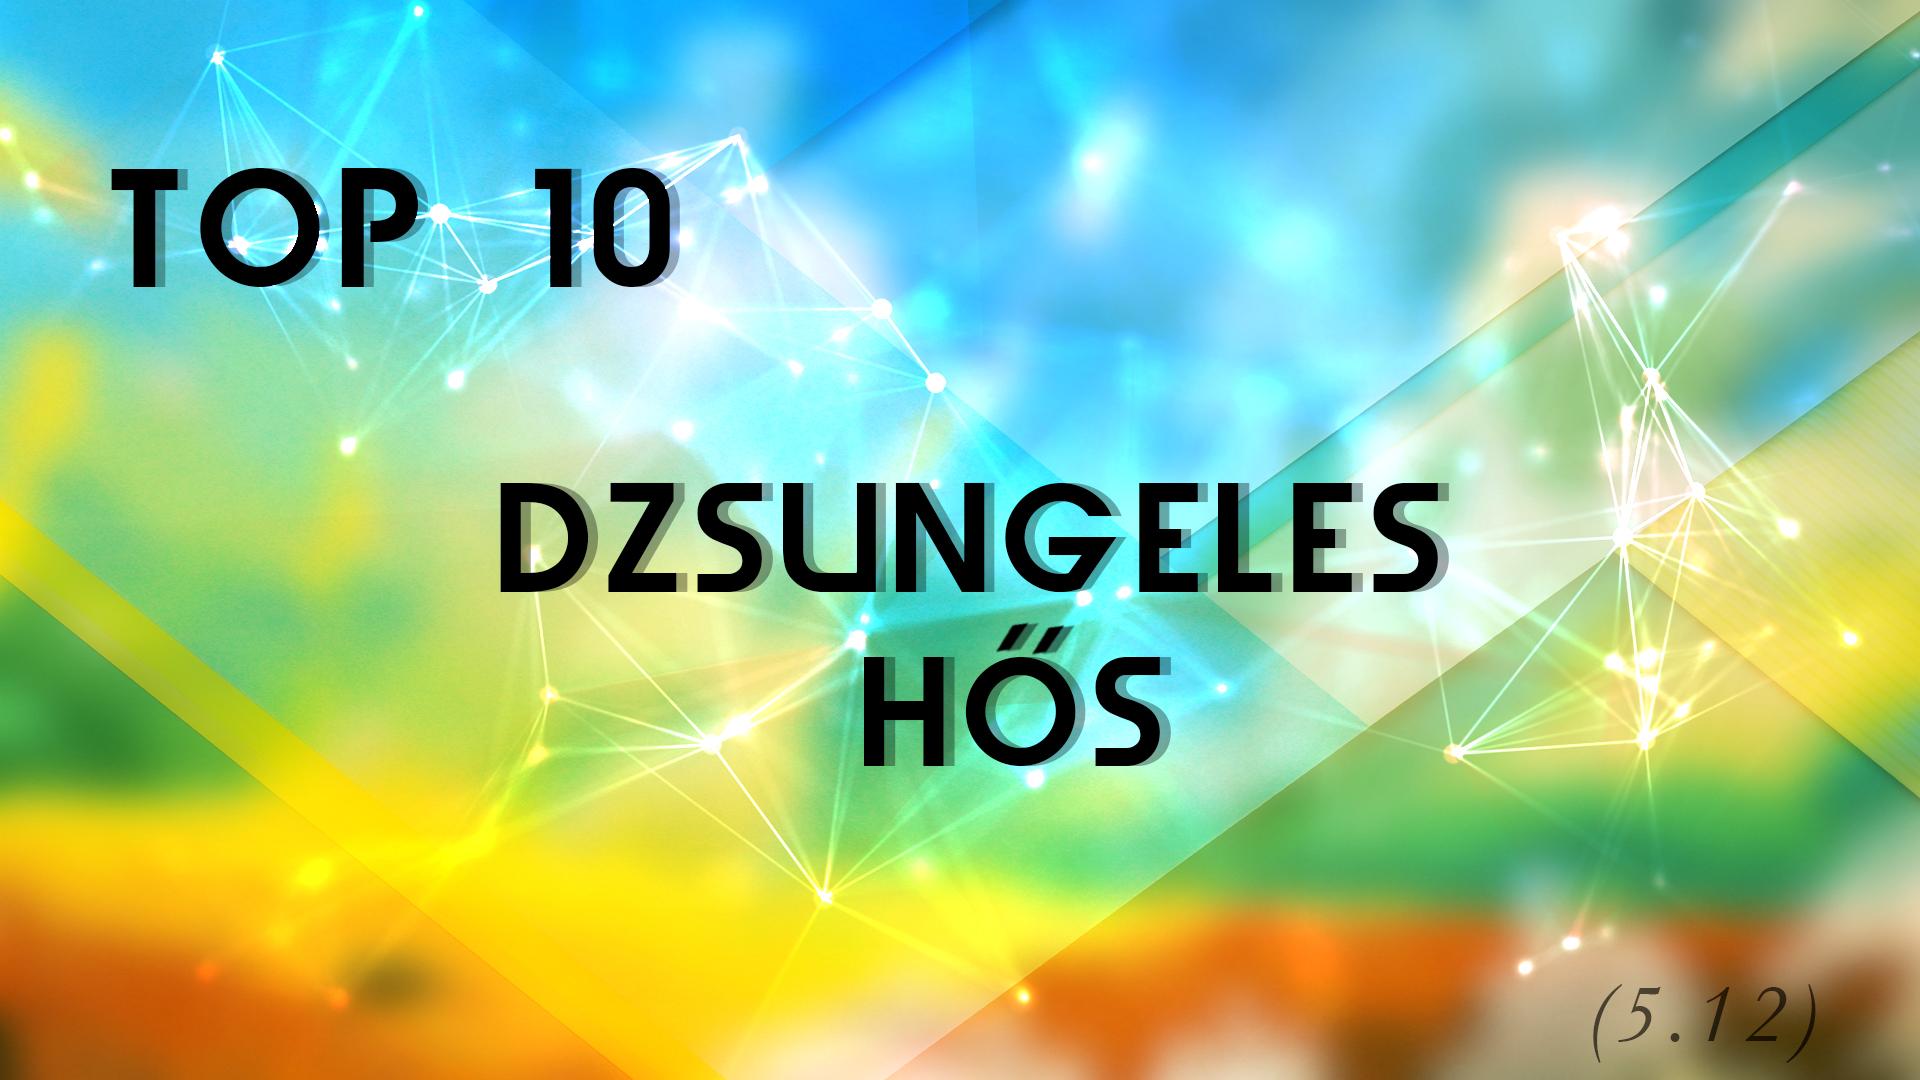 Top 10 dzsungeles hősök (5.12 patch)